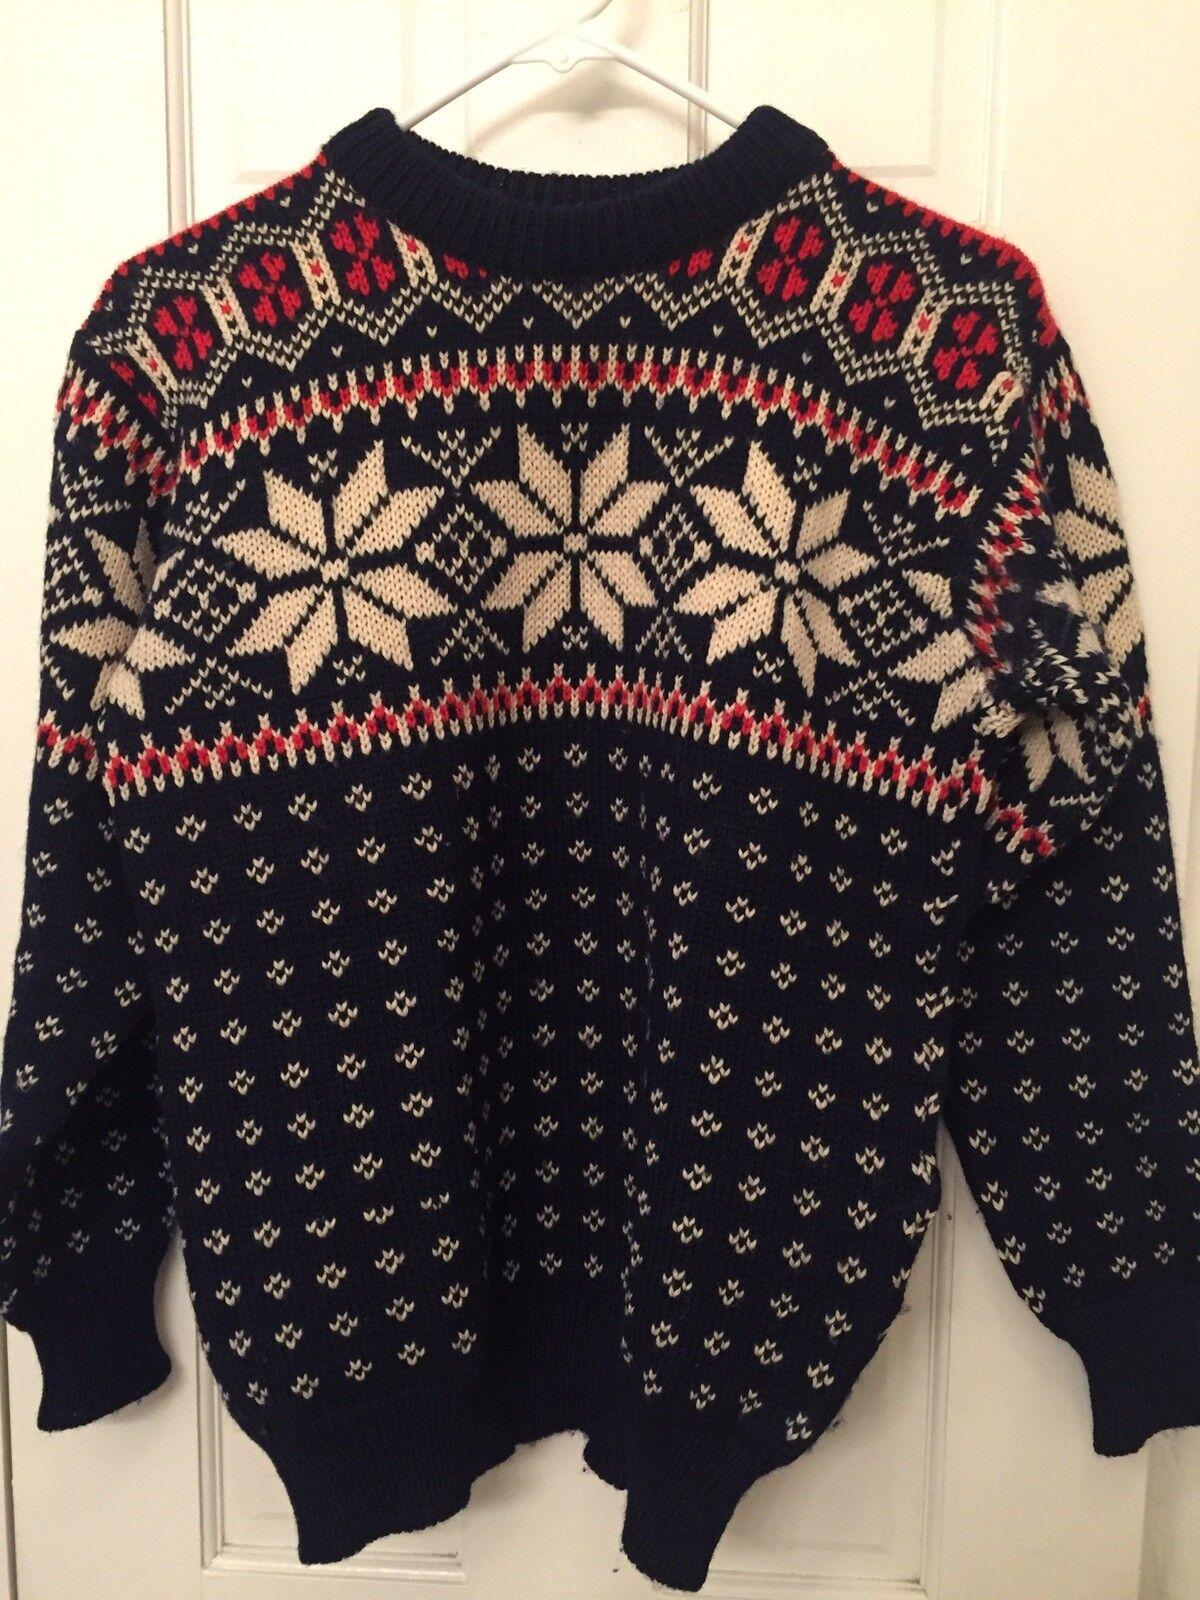 True Vtg LL Bean Christmas Hygge Fair Isle Wool Winter Snowflakes Sweater S-M 38